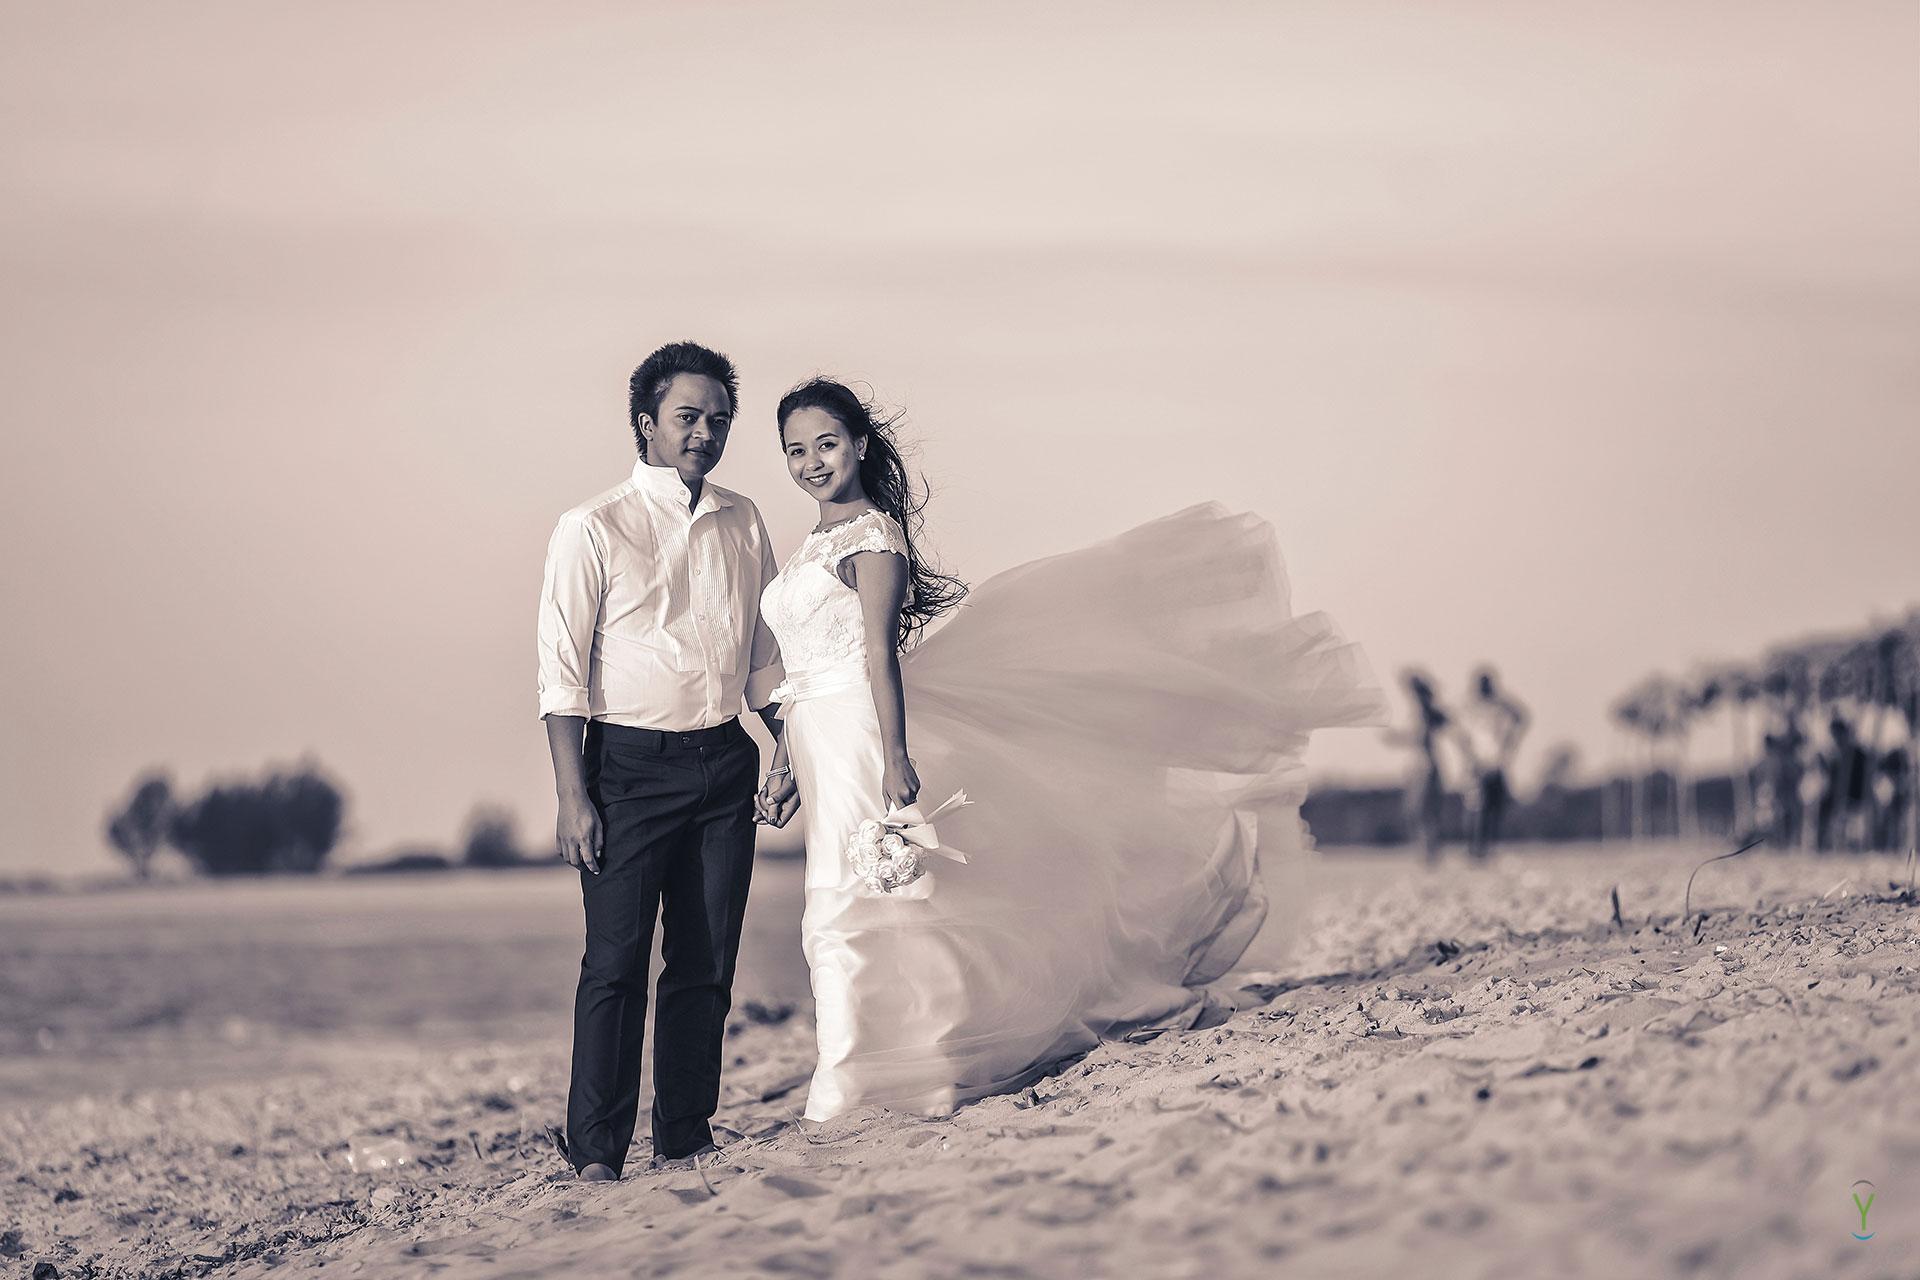 0071_Kiady & Veroniala_17-10-09